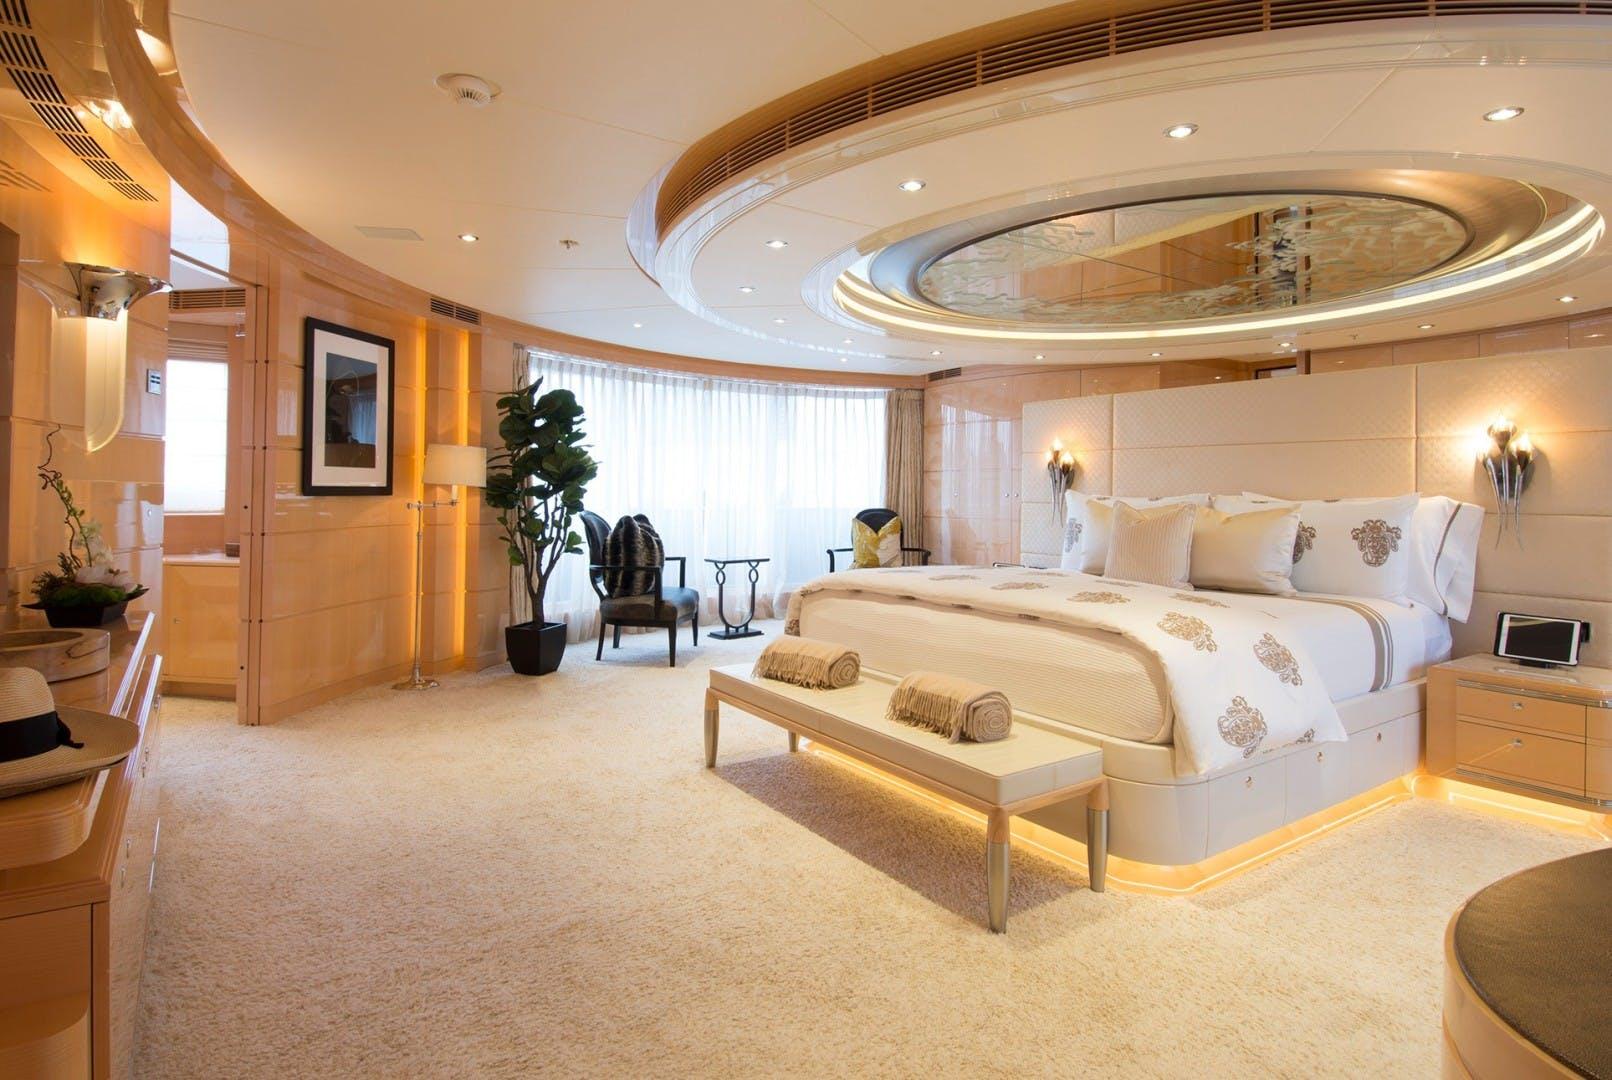 2011 Heesen Yachts 180' Lloyds, LY2/MCA Abbracci | Picture 8 of 11